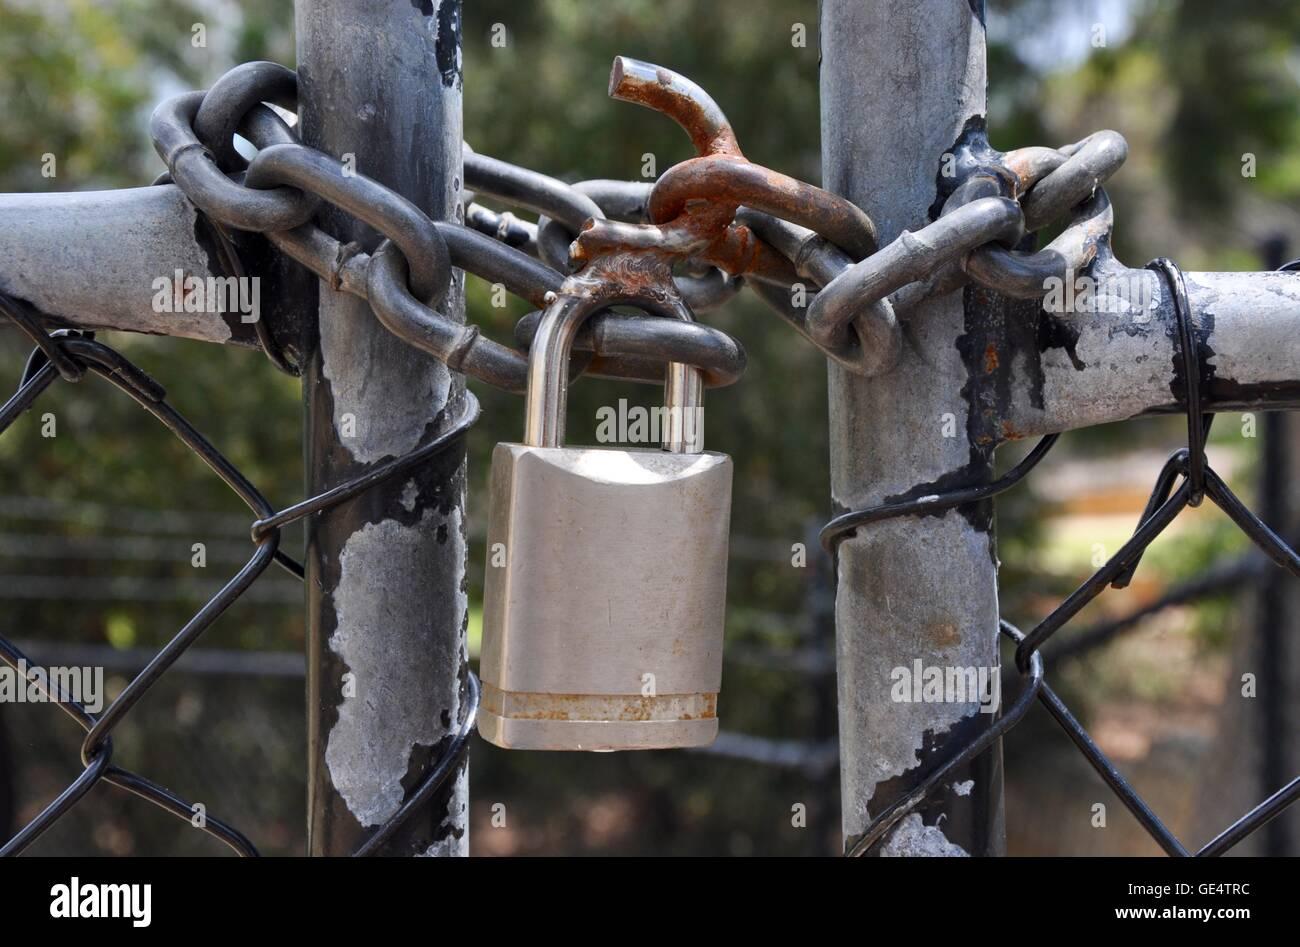 Chain Link Fencing Stockfotos & Chain Link Fencing Bilder - Alamy